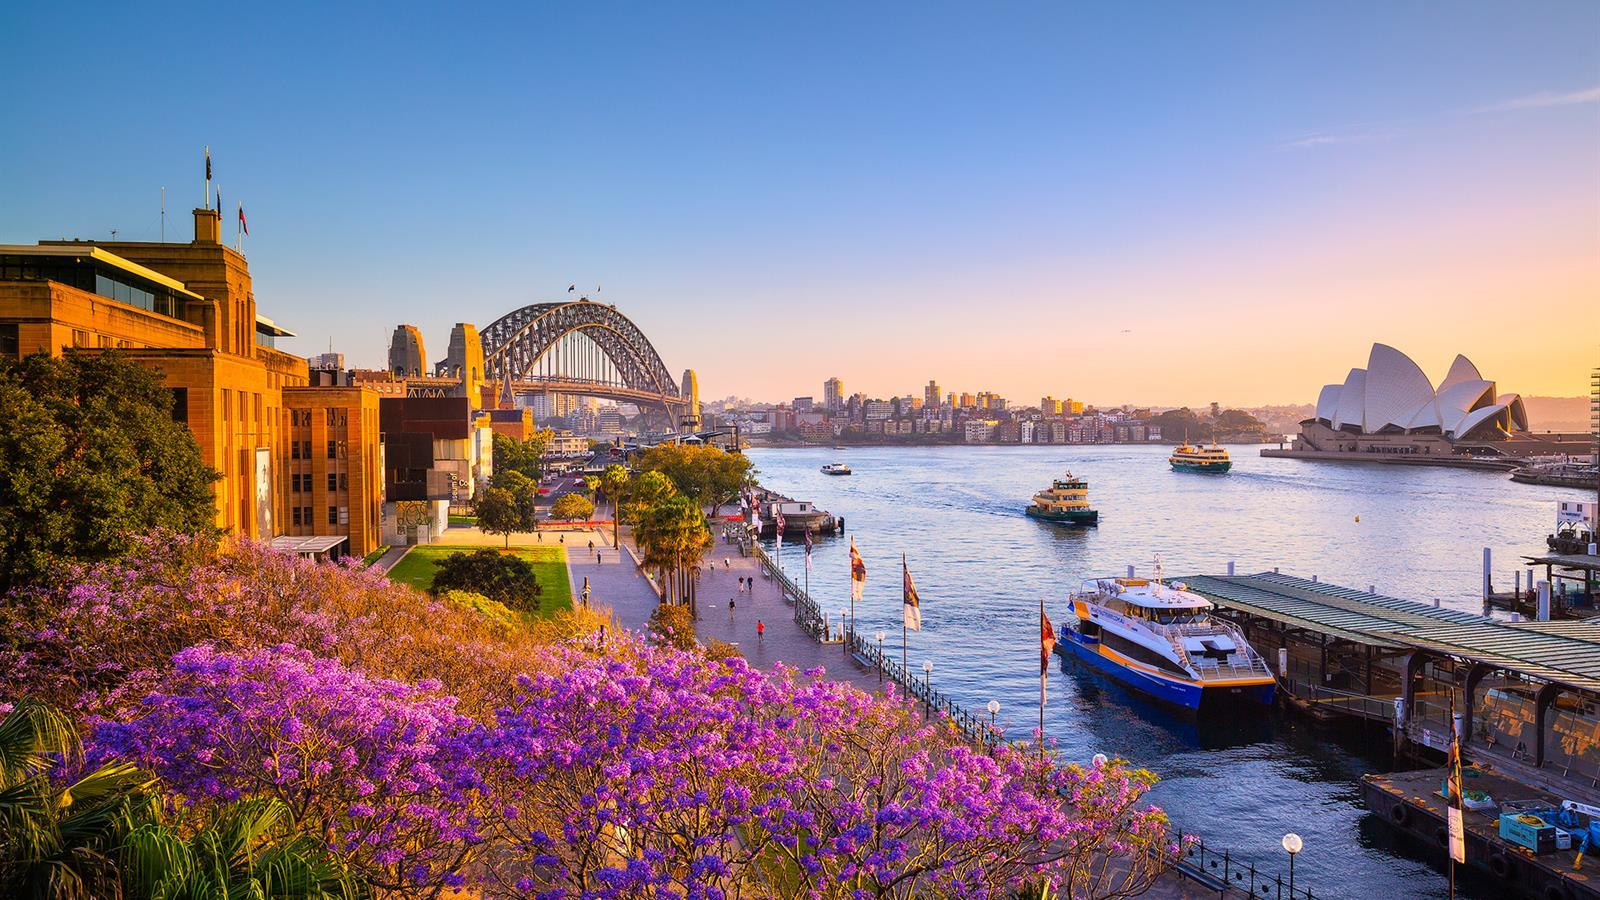 Sydney Weekend Package - 15% OFF! The York Sydney by Swiss-Belhotel, Sydney CBD